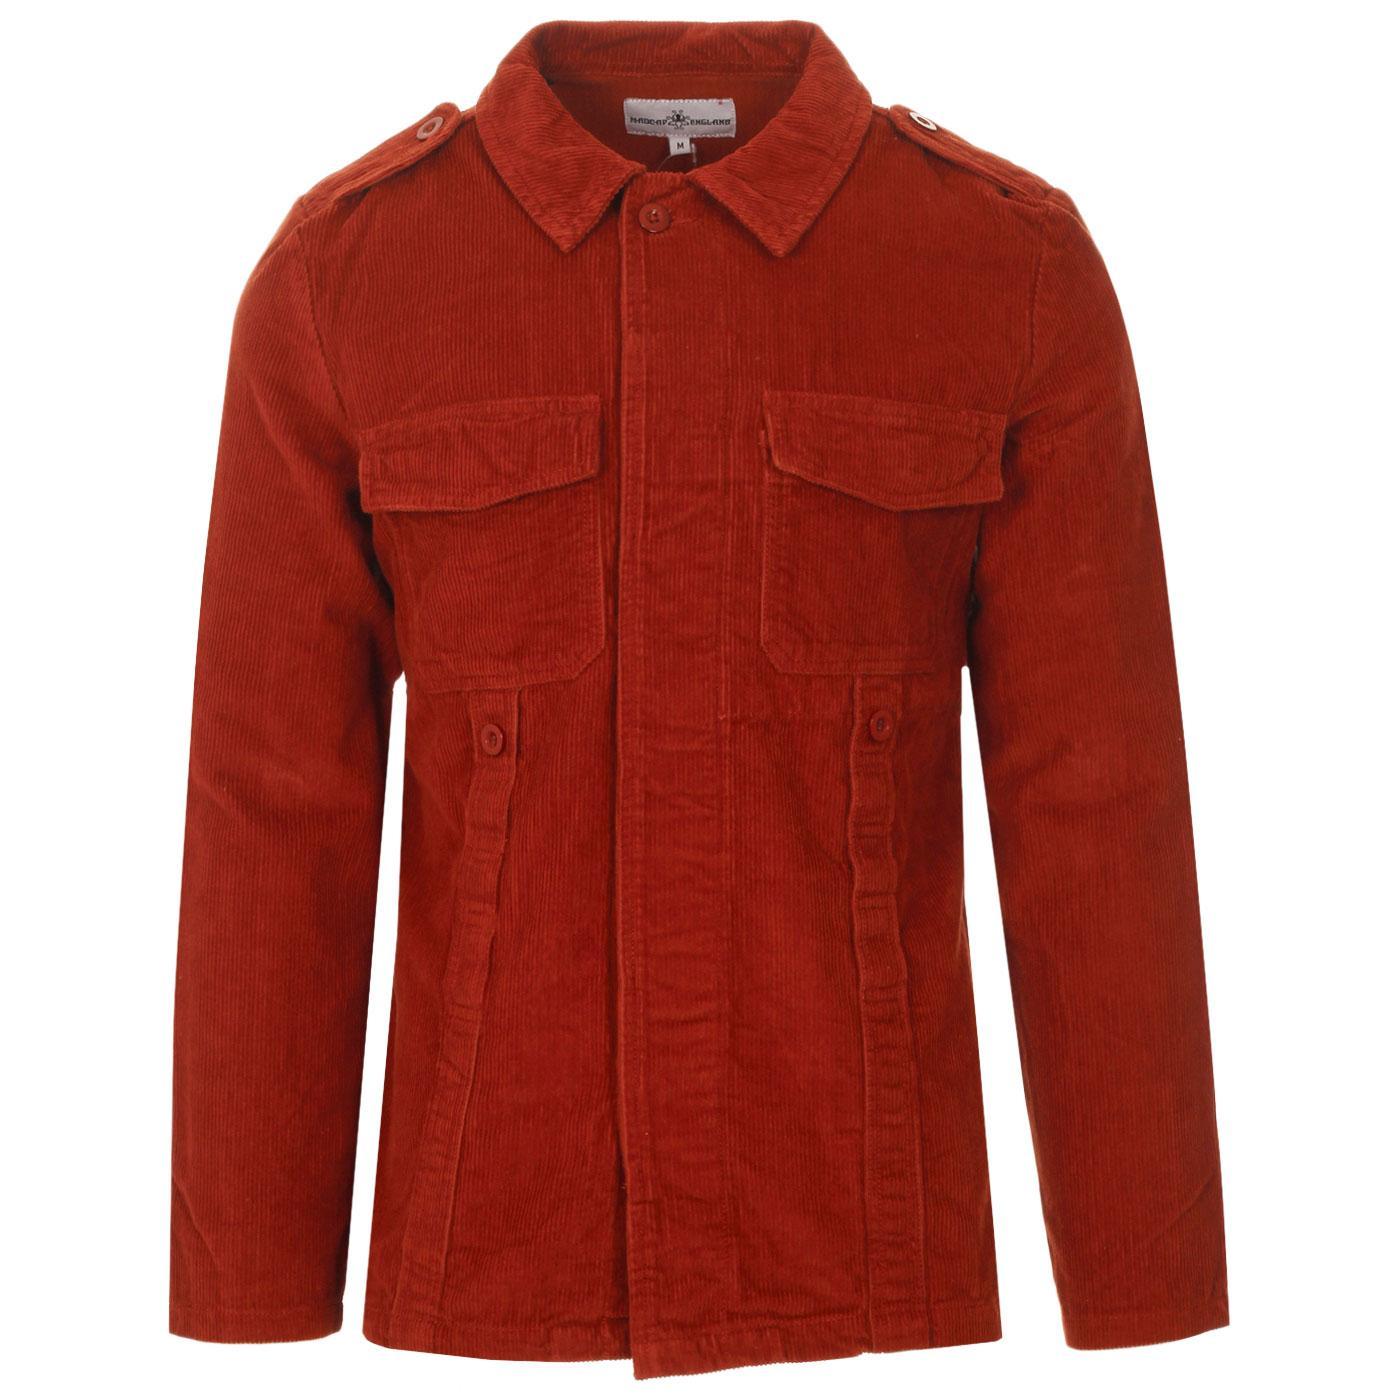 Madcap England Lennon Men's Retro Mod Cord Overshirt Jacket in Rust